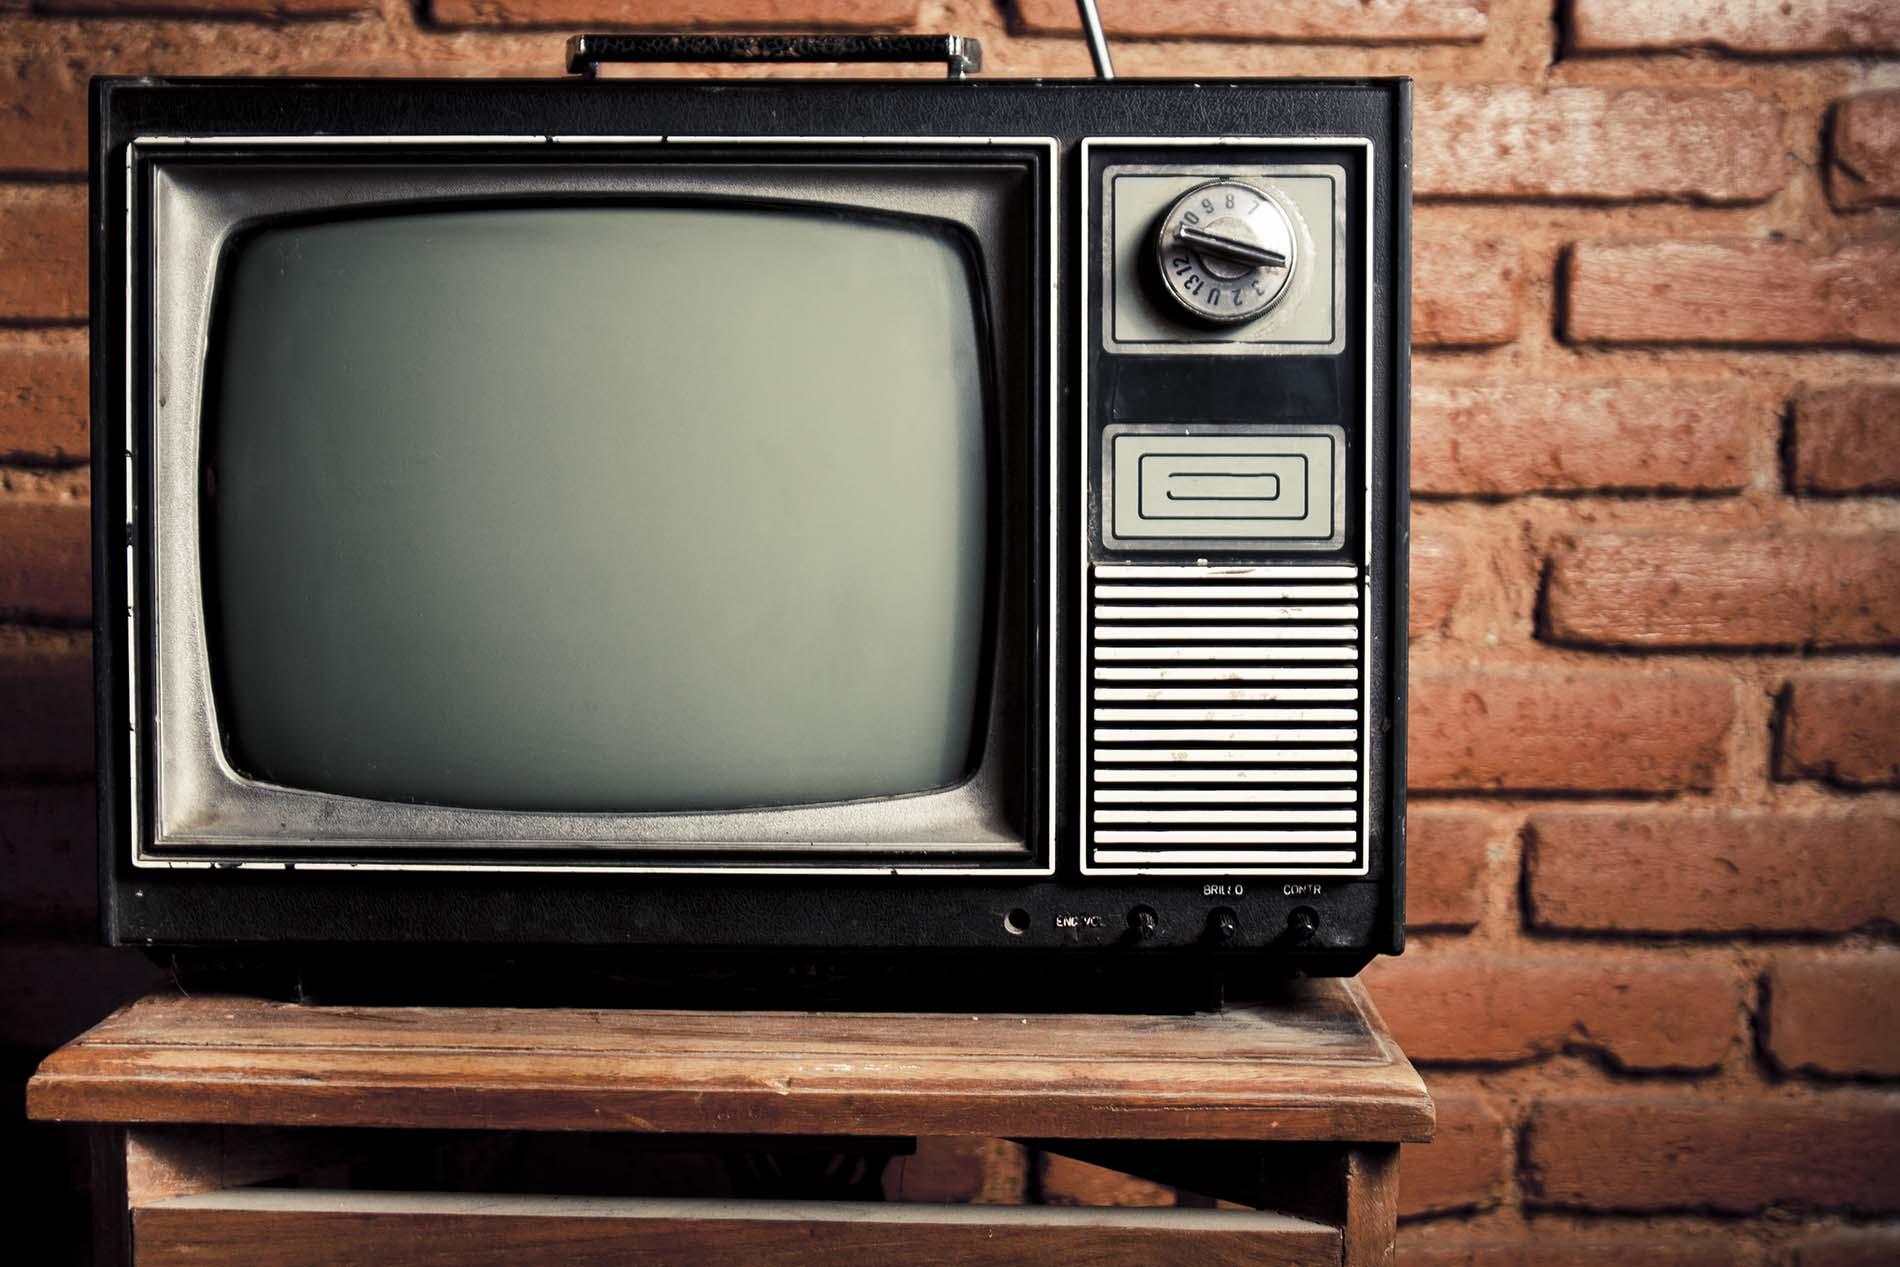 Vintage TV And Valve Appliance Repair Services DRTV